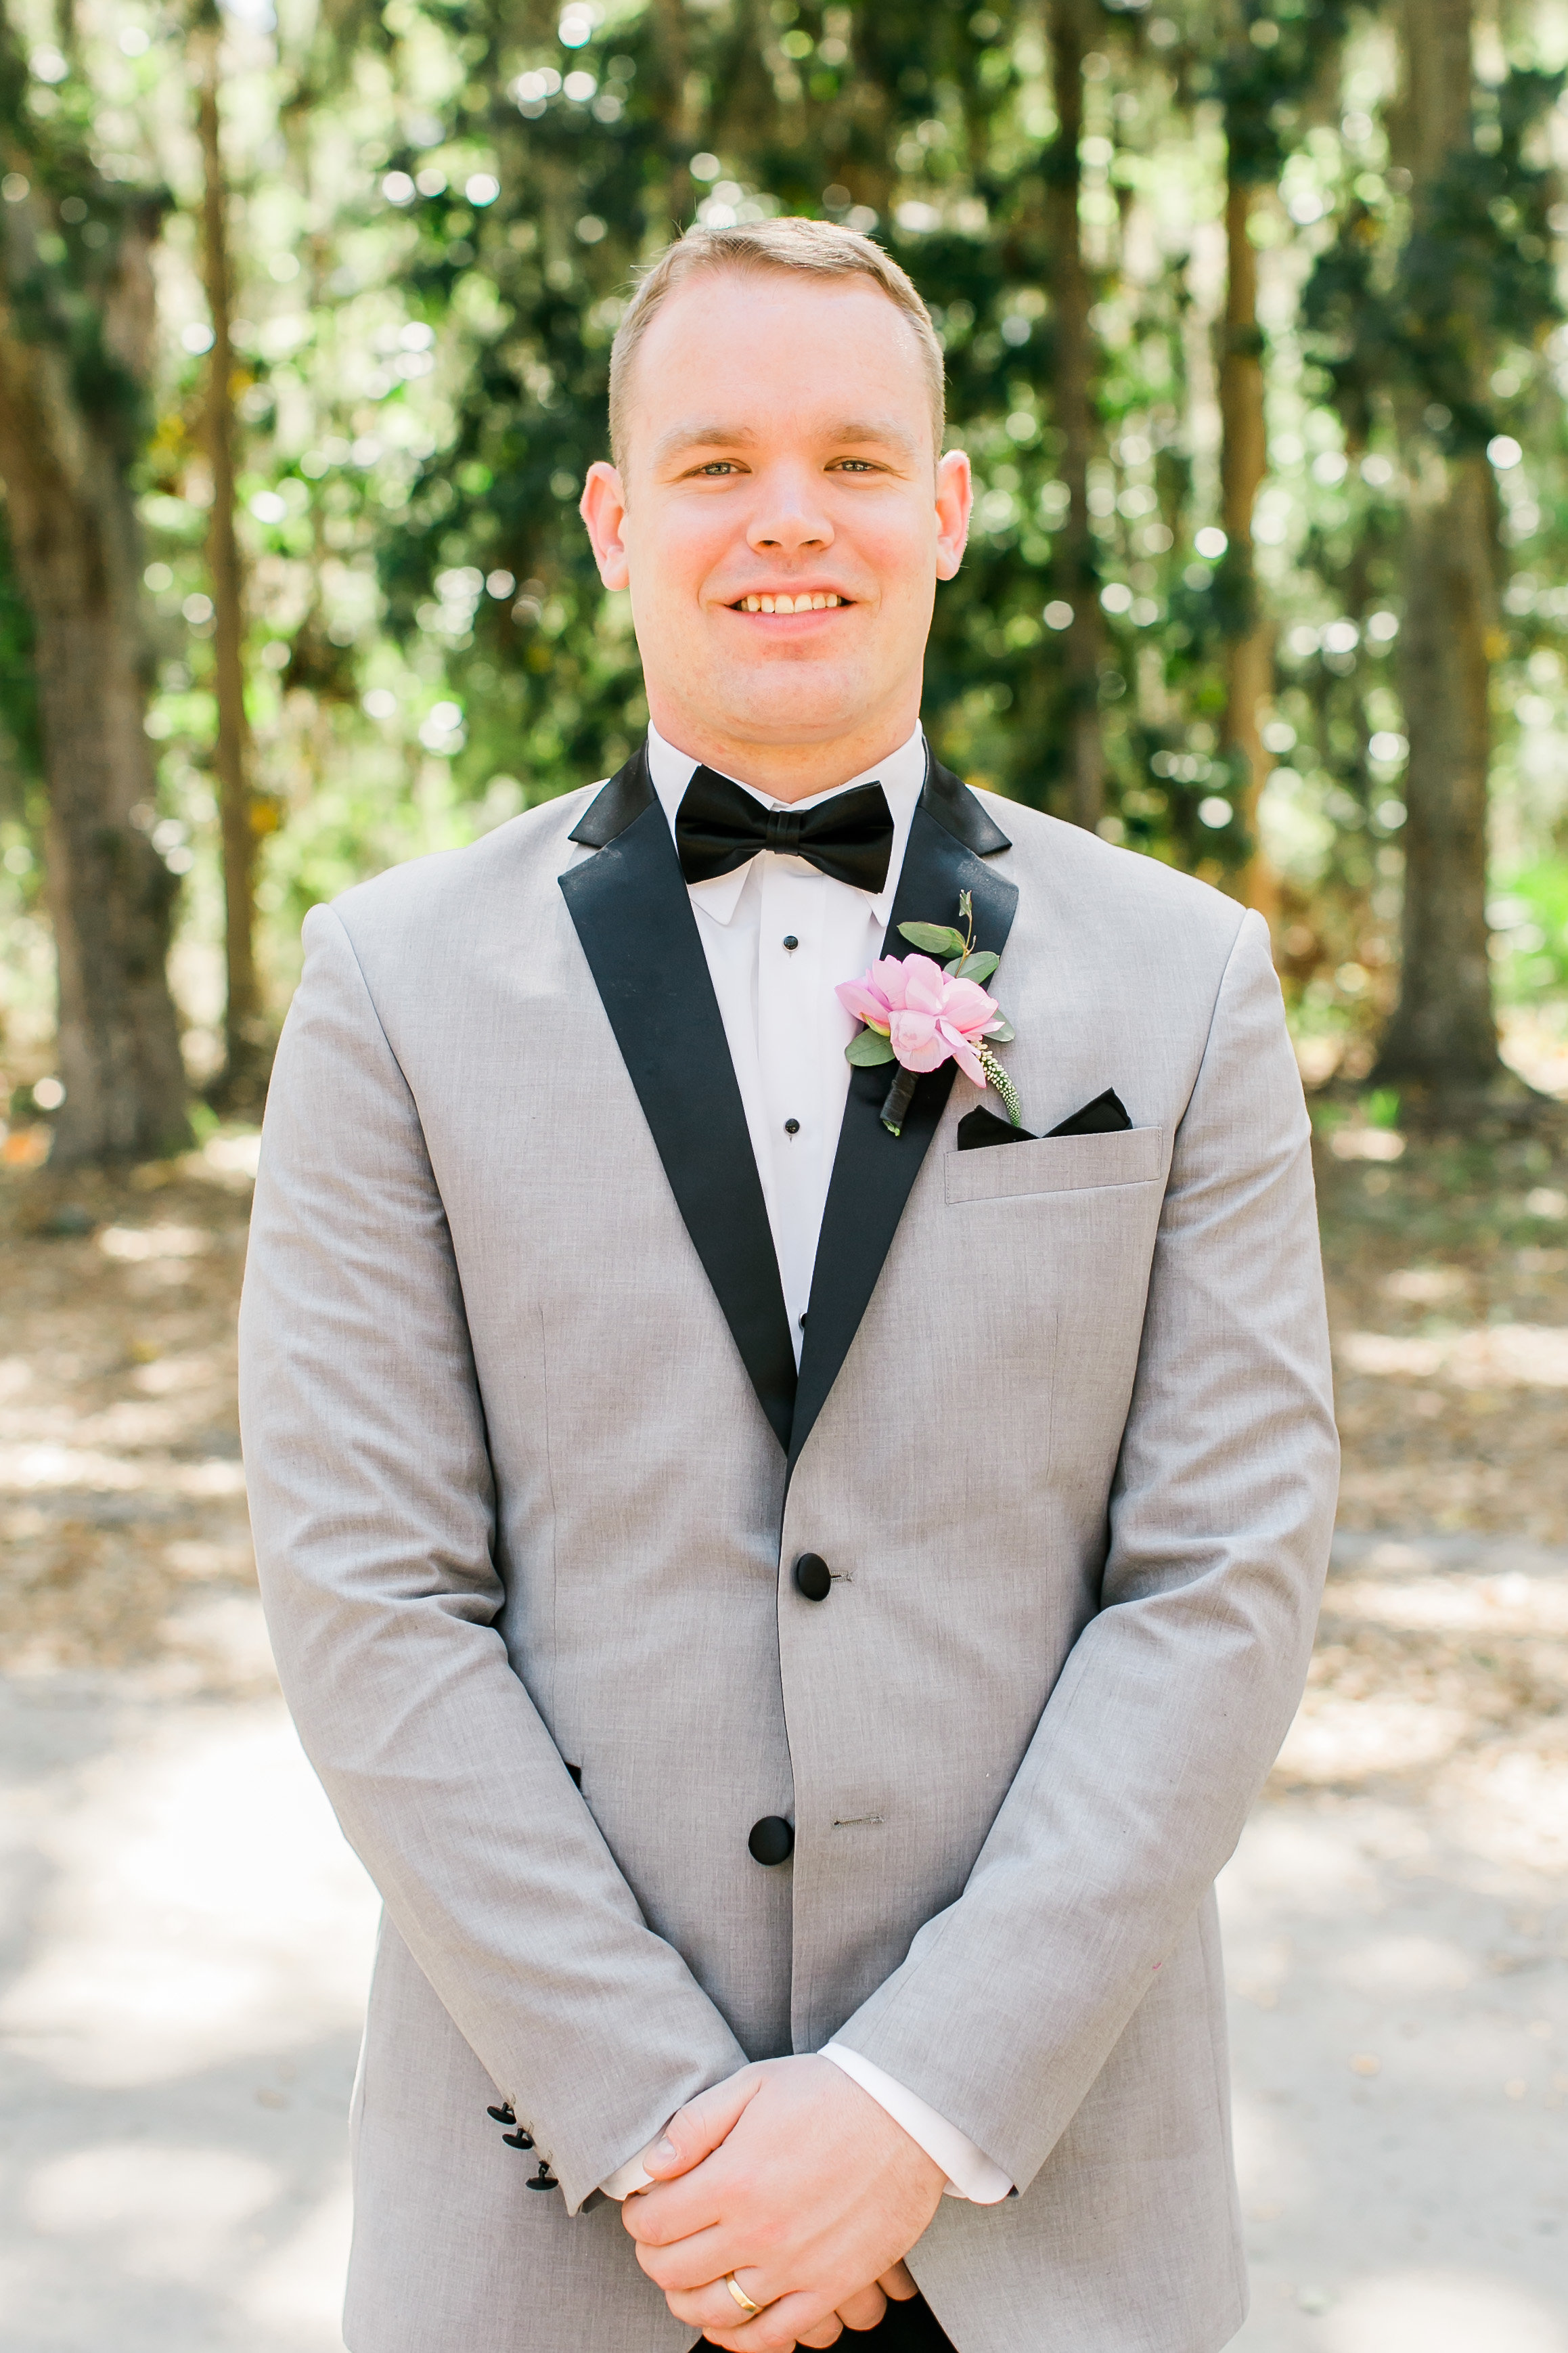 Savannah GA groom in grey tuxedo for destination wedding